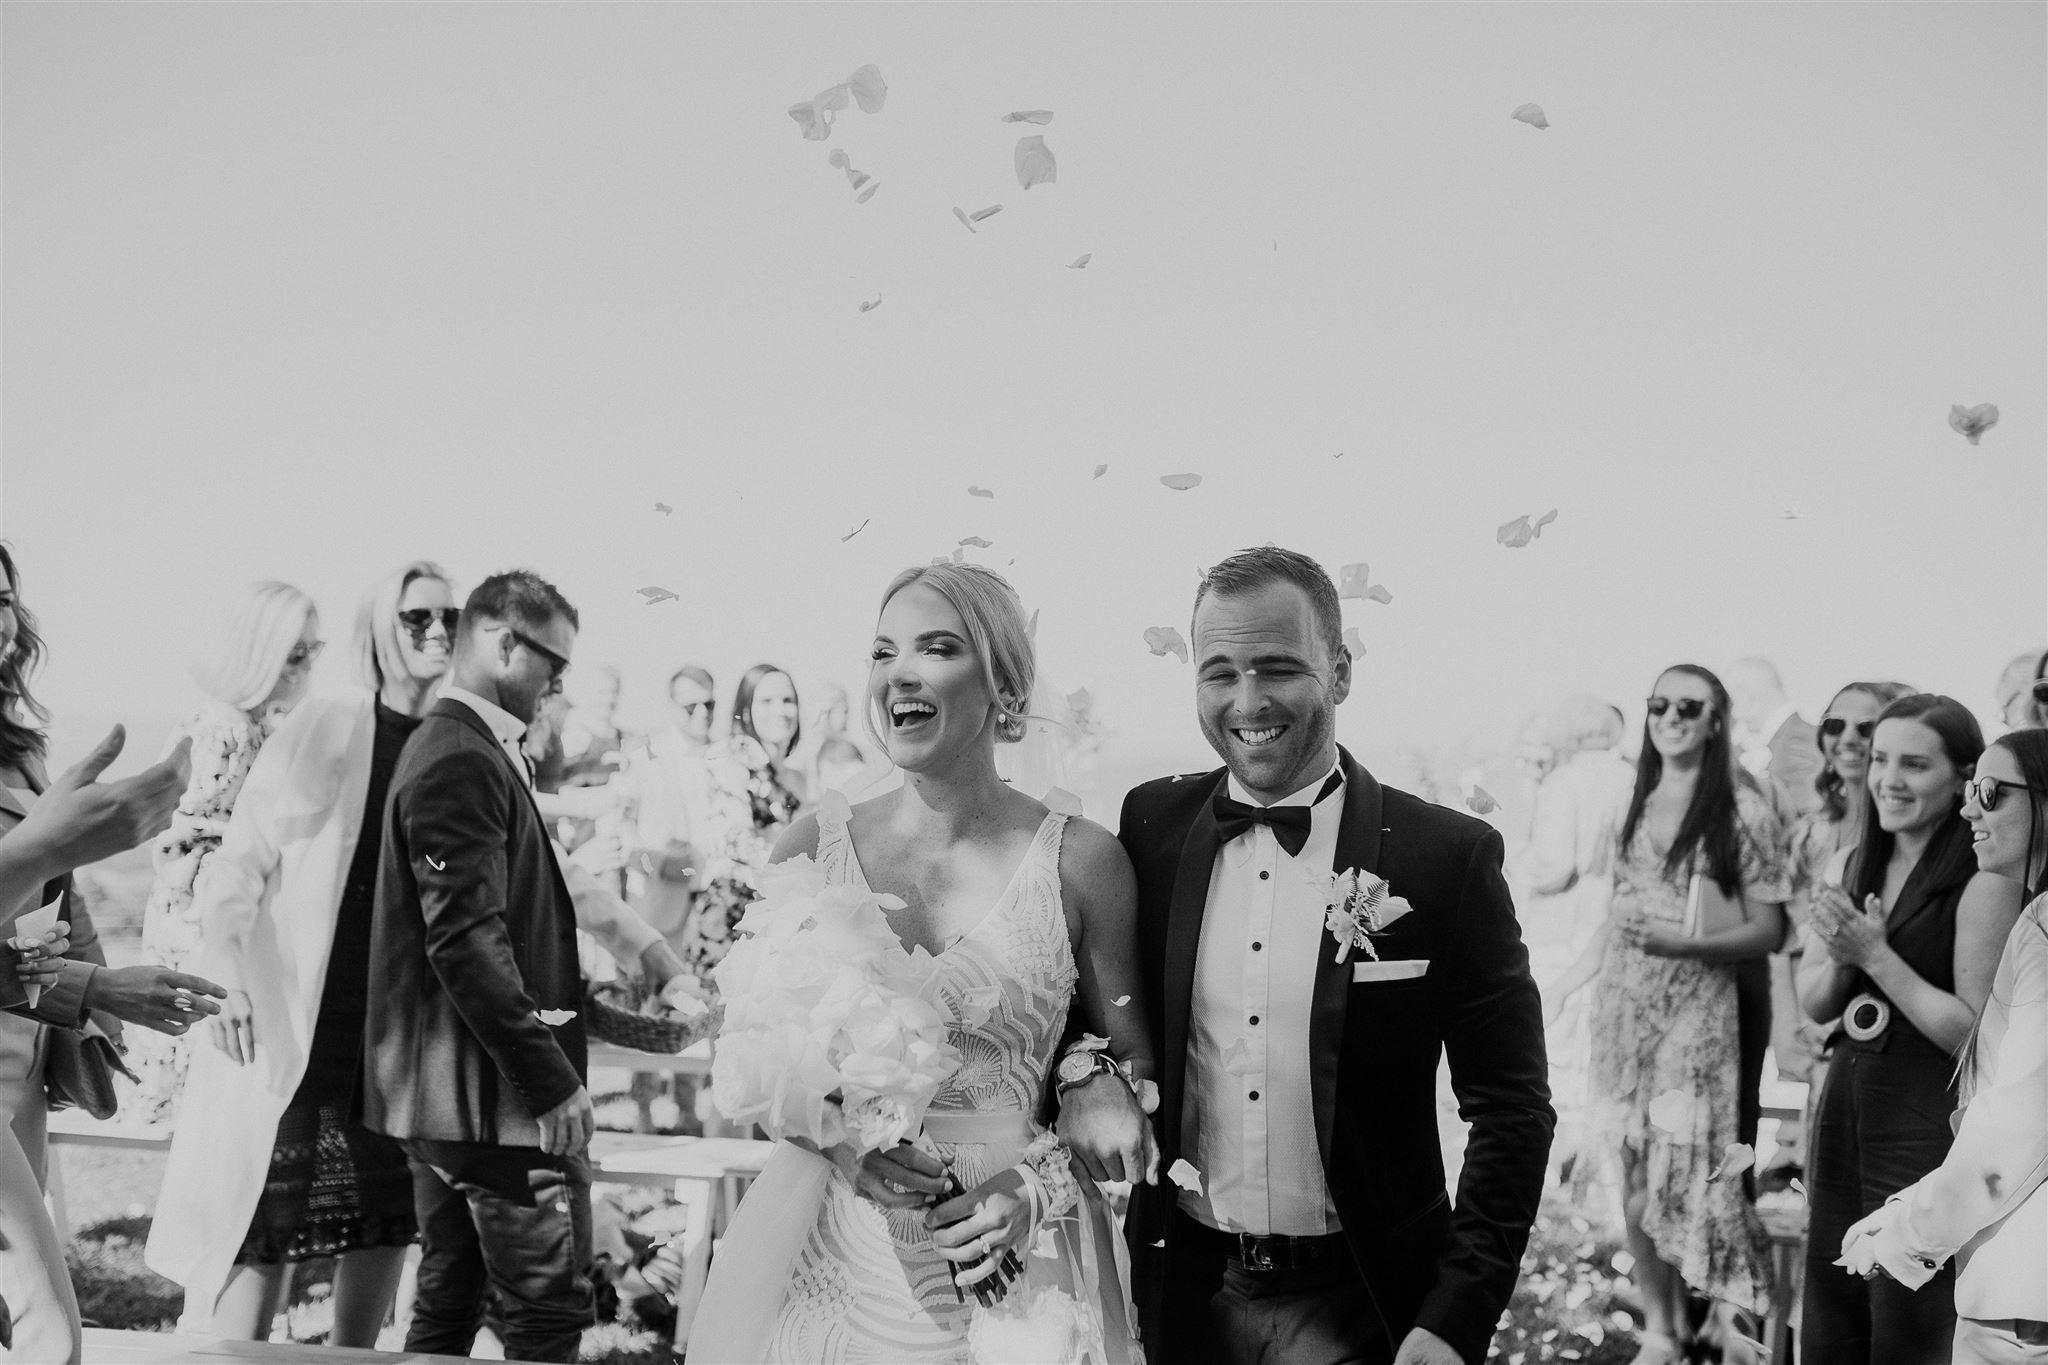 https://scenicrimbride.com.au/wp-content/uploads/2021/01/Scenic-Rim-Bride369_websize.jpg